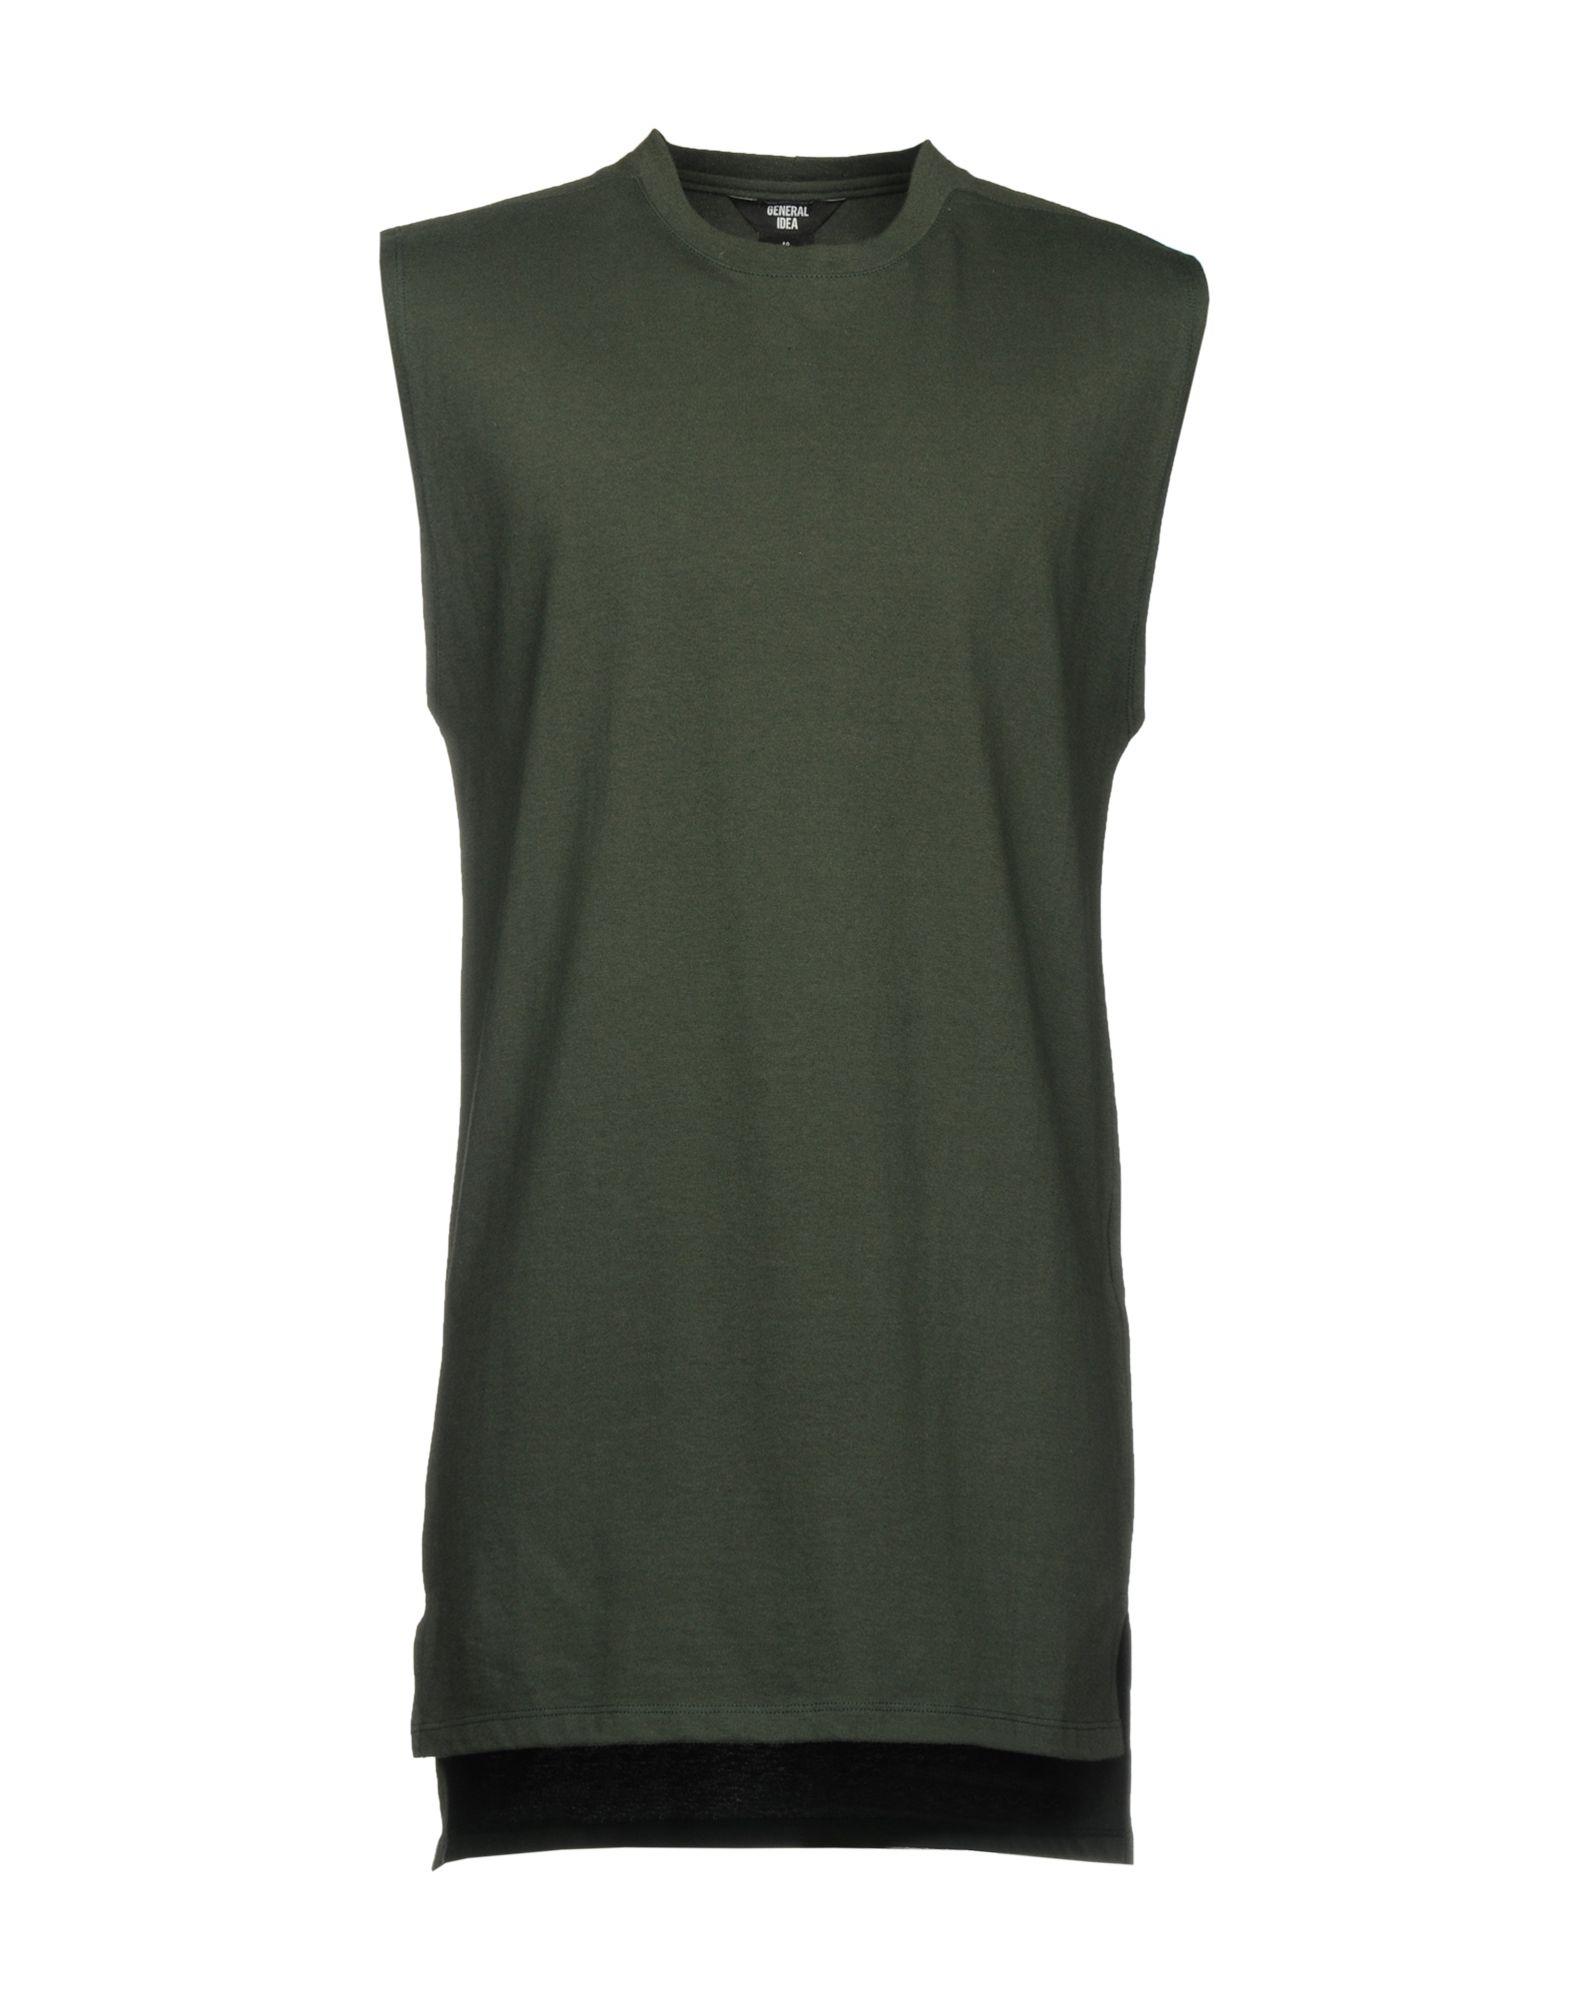 GENERAL IDEA T-Shirt in Dark Green